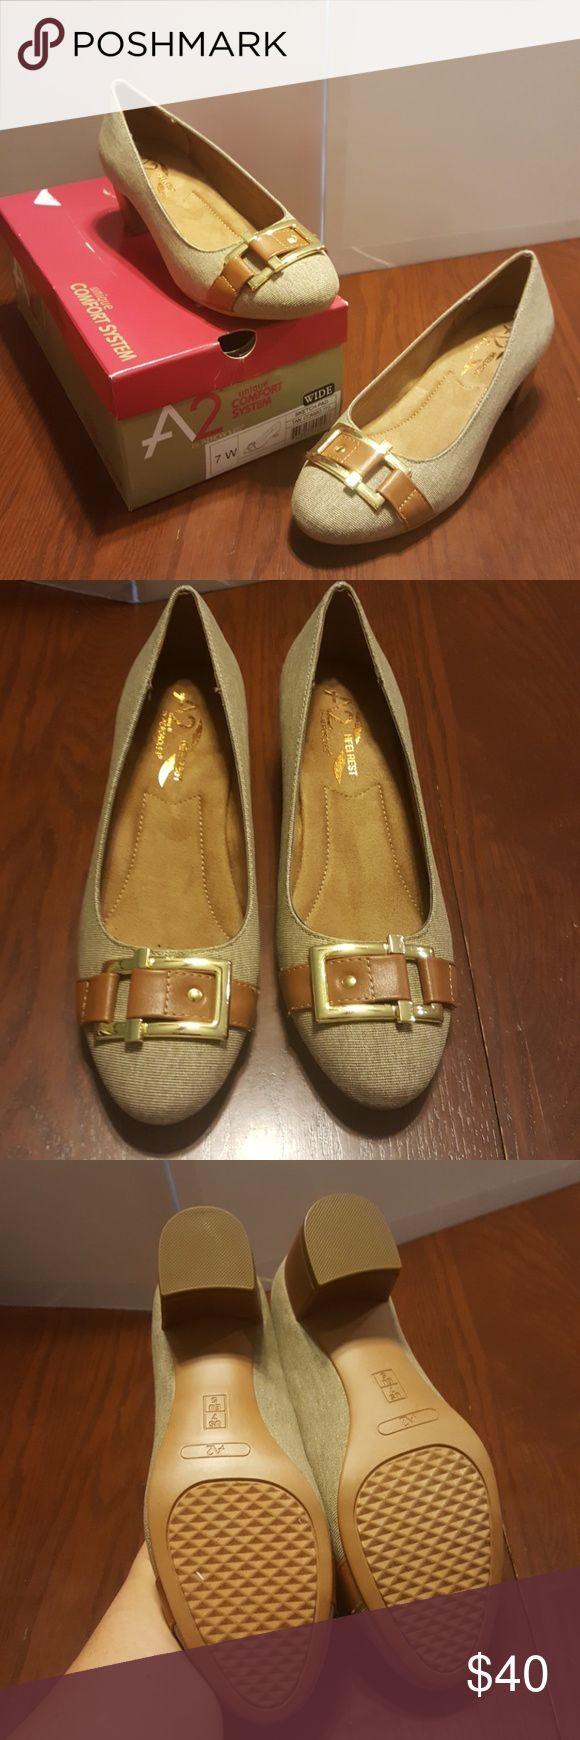 A2 Aerosoles 7W Sketch Pad Tan chunky heel NWT Adorable!  Makes your feet happy! AEROSOLES Shoes Heels